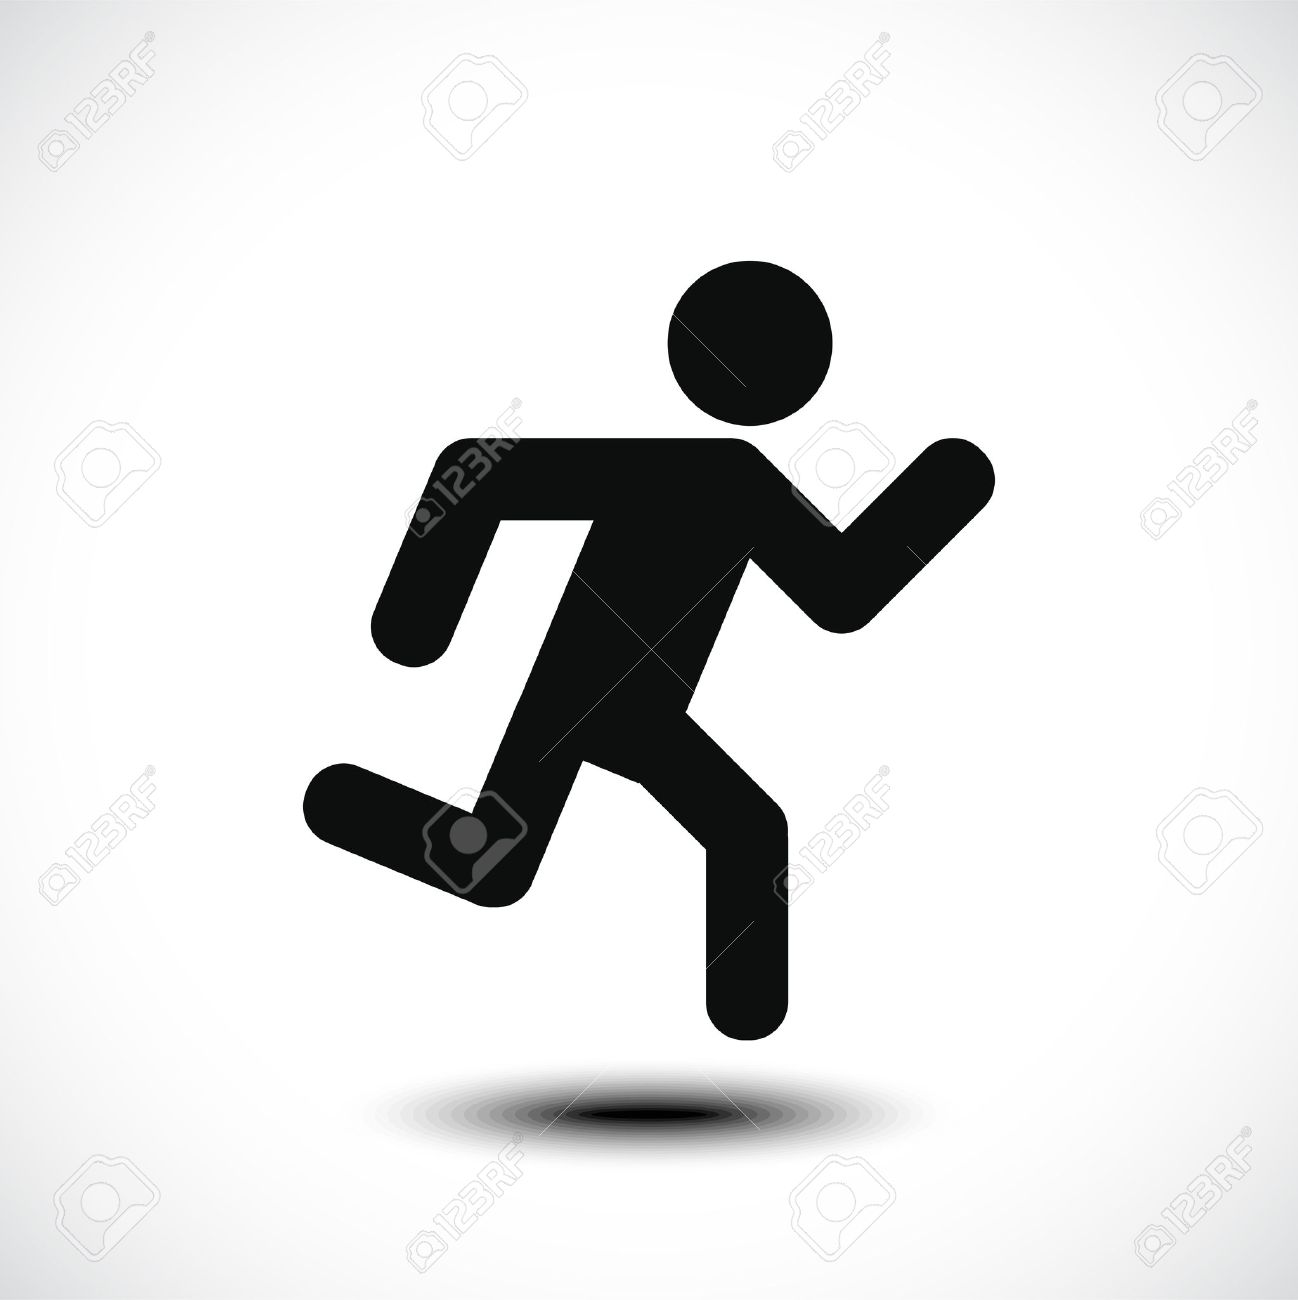 Running Man Icon Vector Illustration Royalty Free Cliparts Vectors